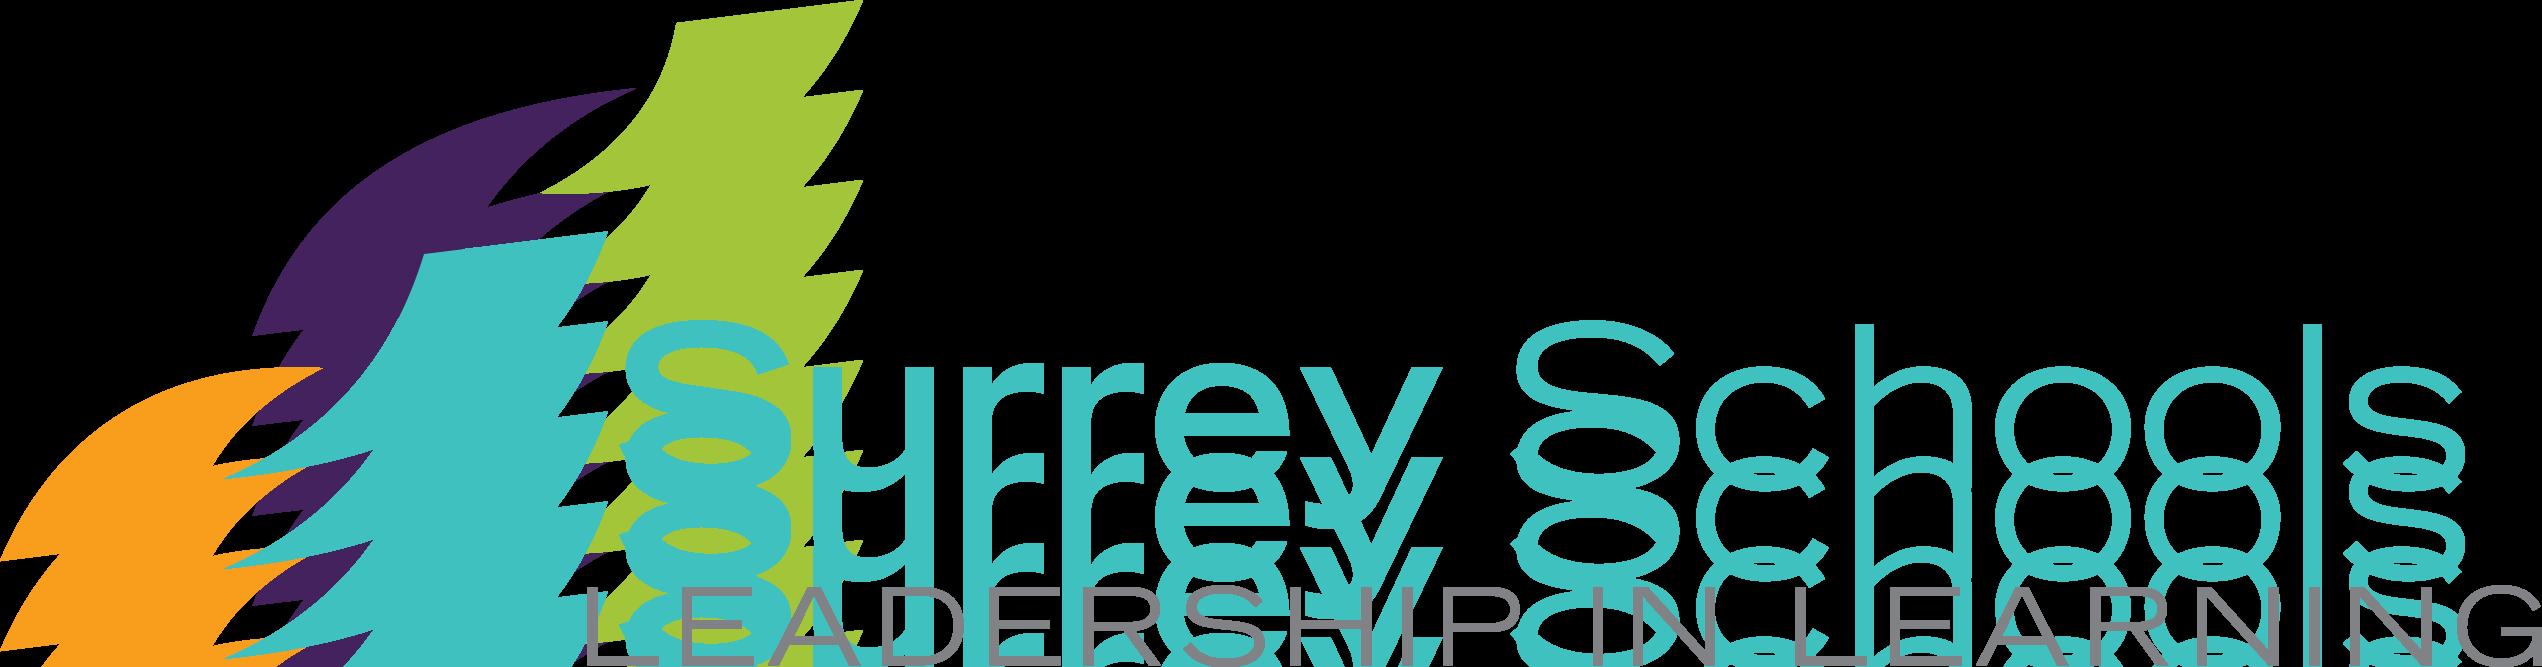 growing-together_surrey-schools-logo